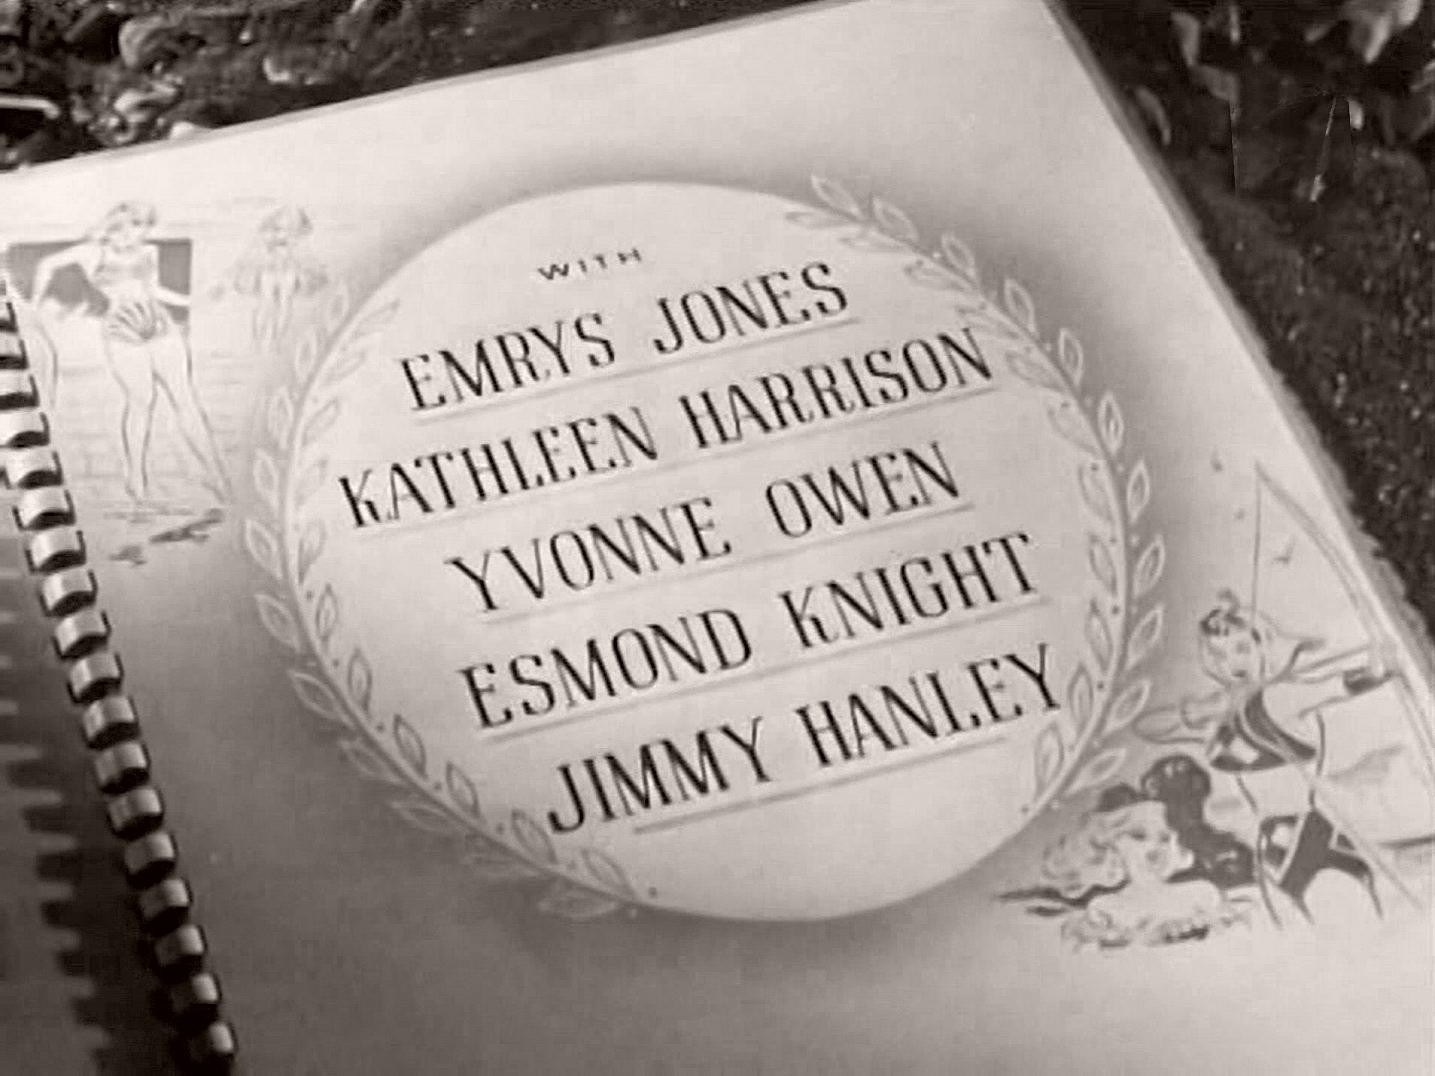 Main title from Holiday Camp (1947) (5).  With Emrys Jones Kathleen Harrison, Yvonne Owen, Esmond Knight, Jimmy Hanley